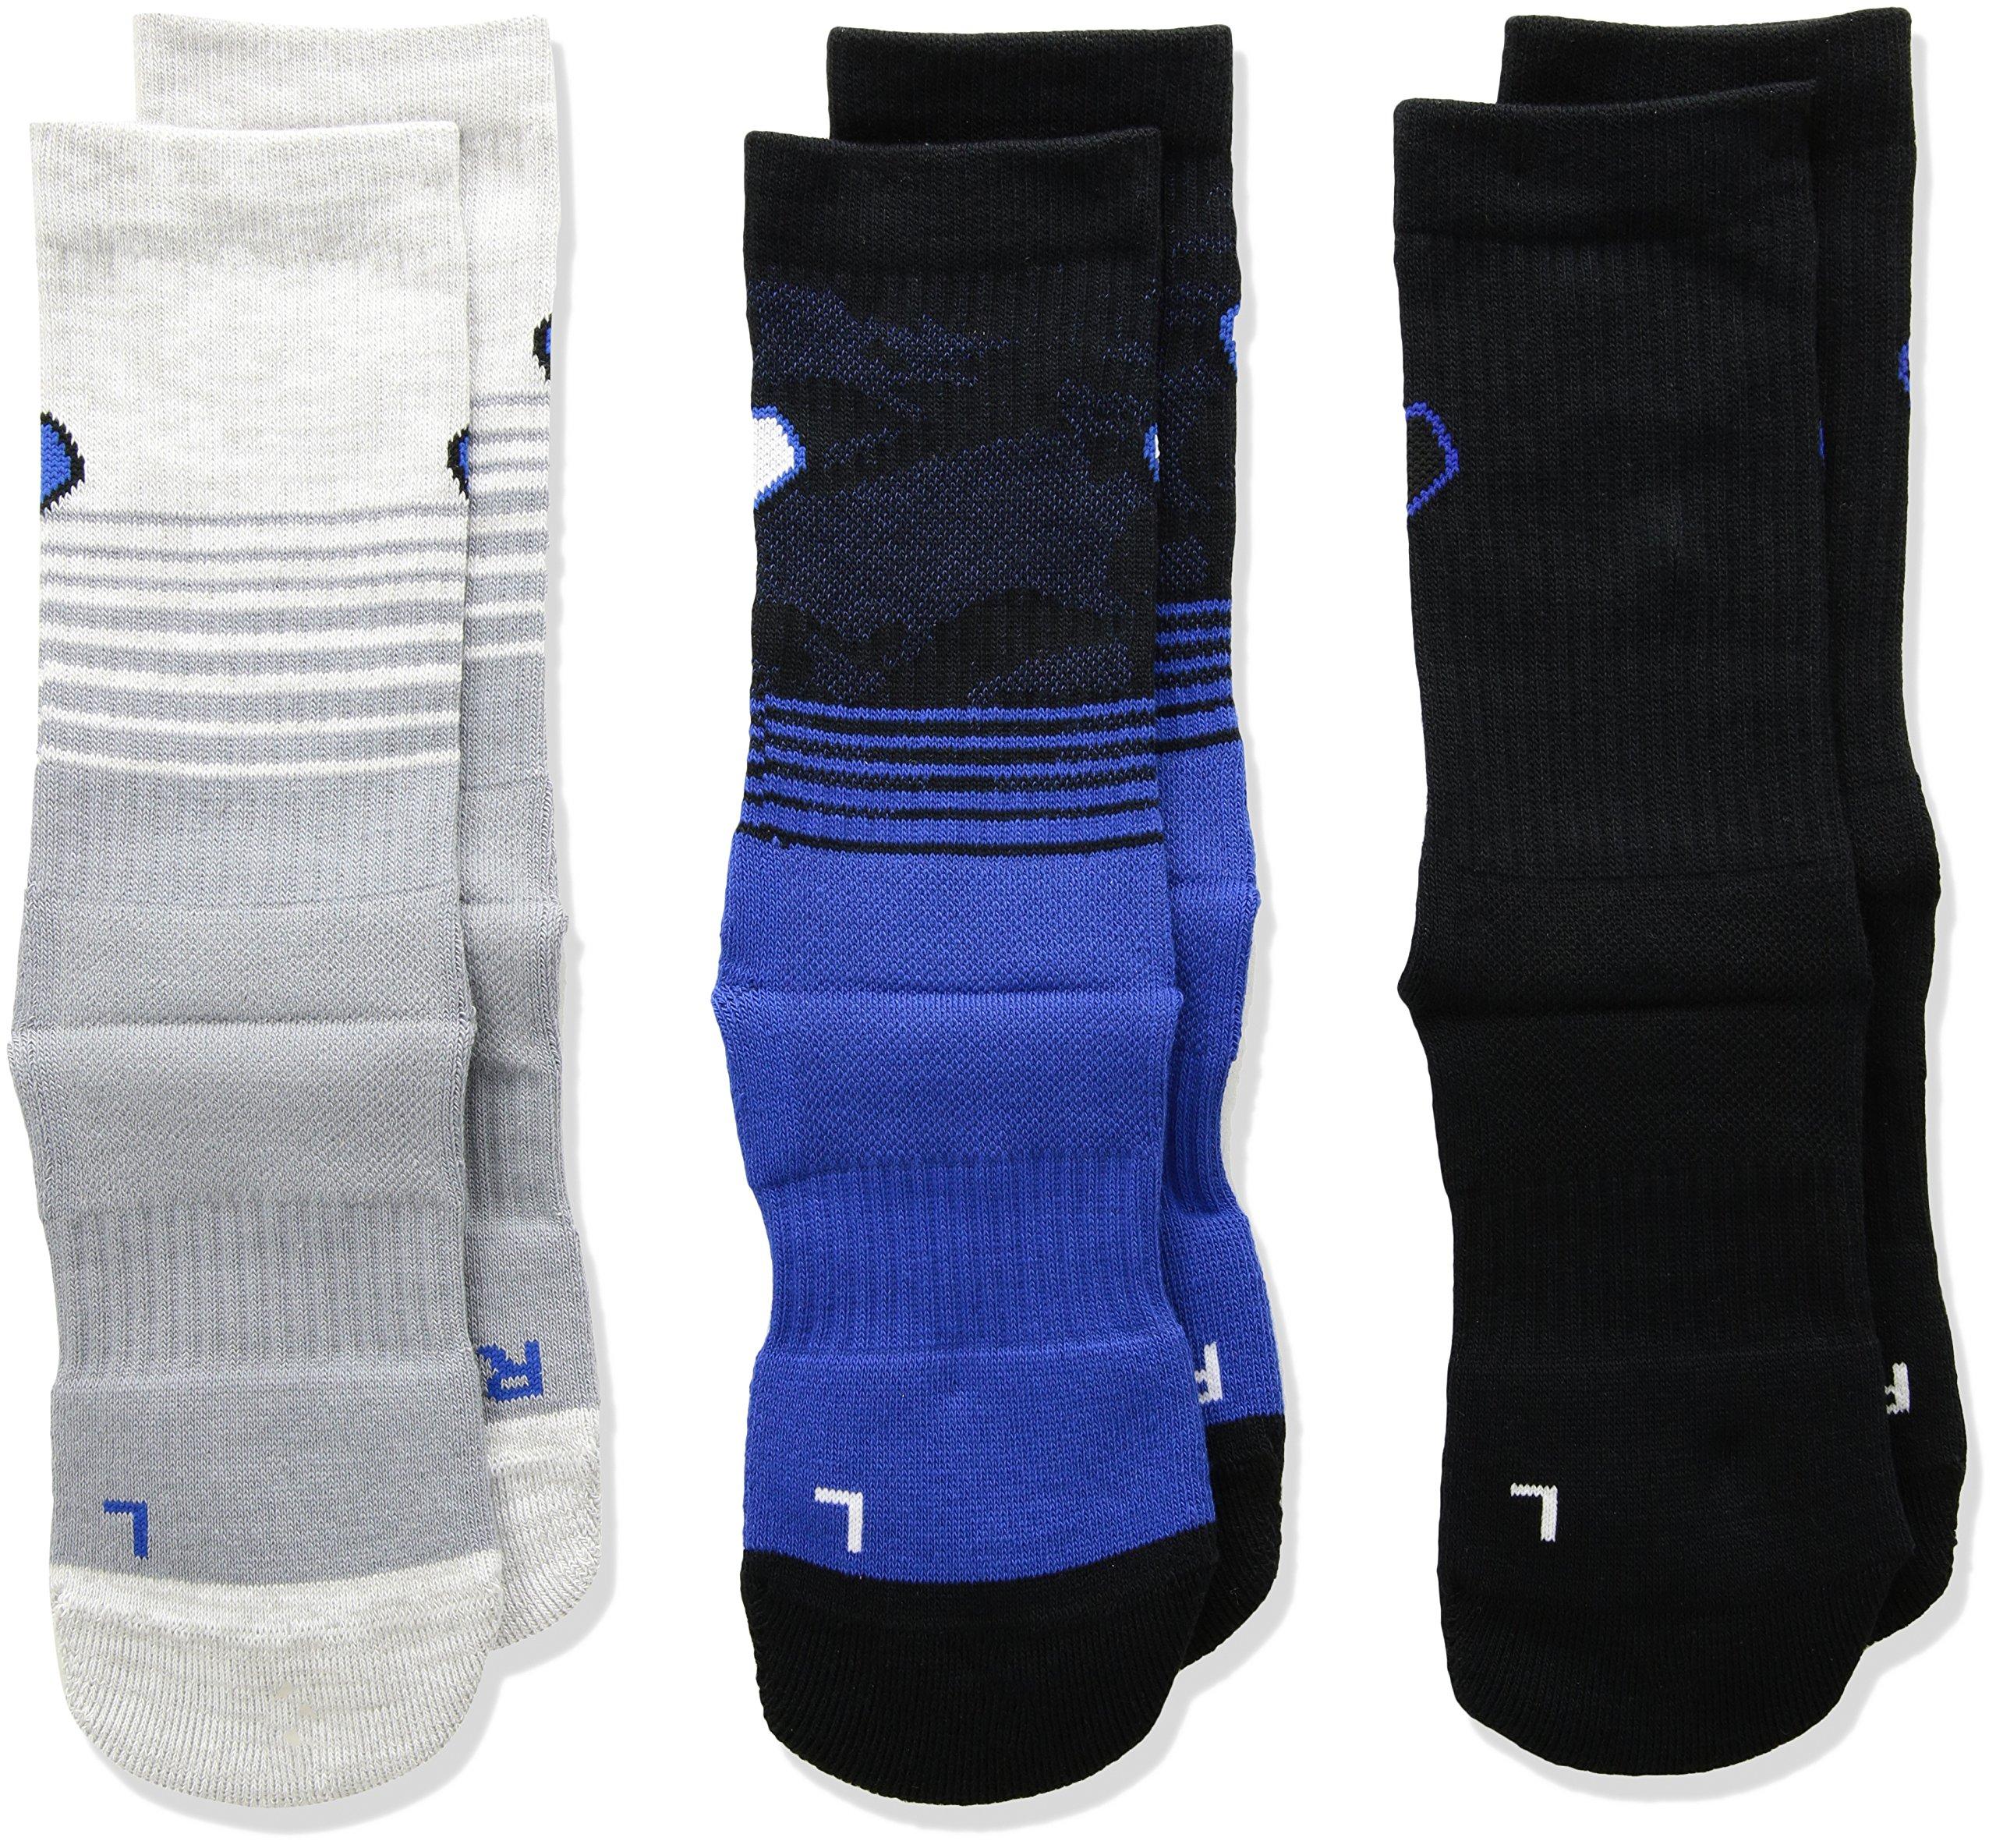 Under Armour Boy`s UA Phenom Crew Socks 3 Pack (Youth Medium (Youth Shoe Size 4Y - 8Y), Black (1299805-967) / Heather Grey/Blue) by Under Armour